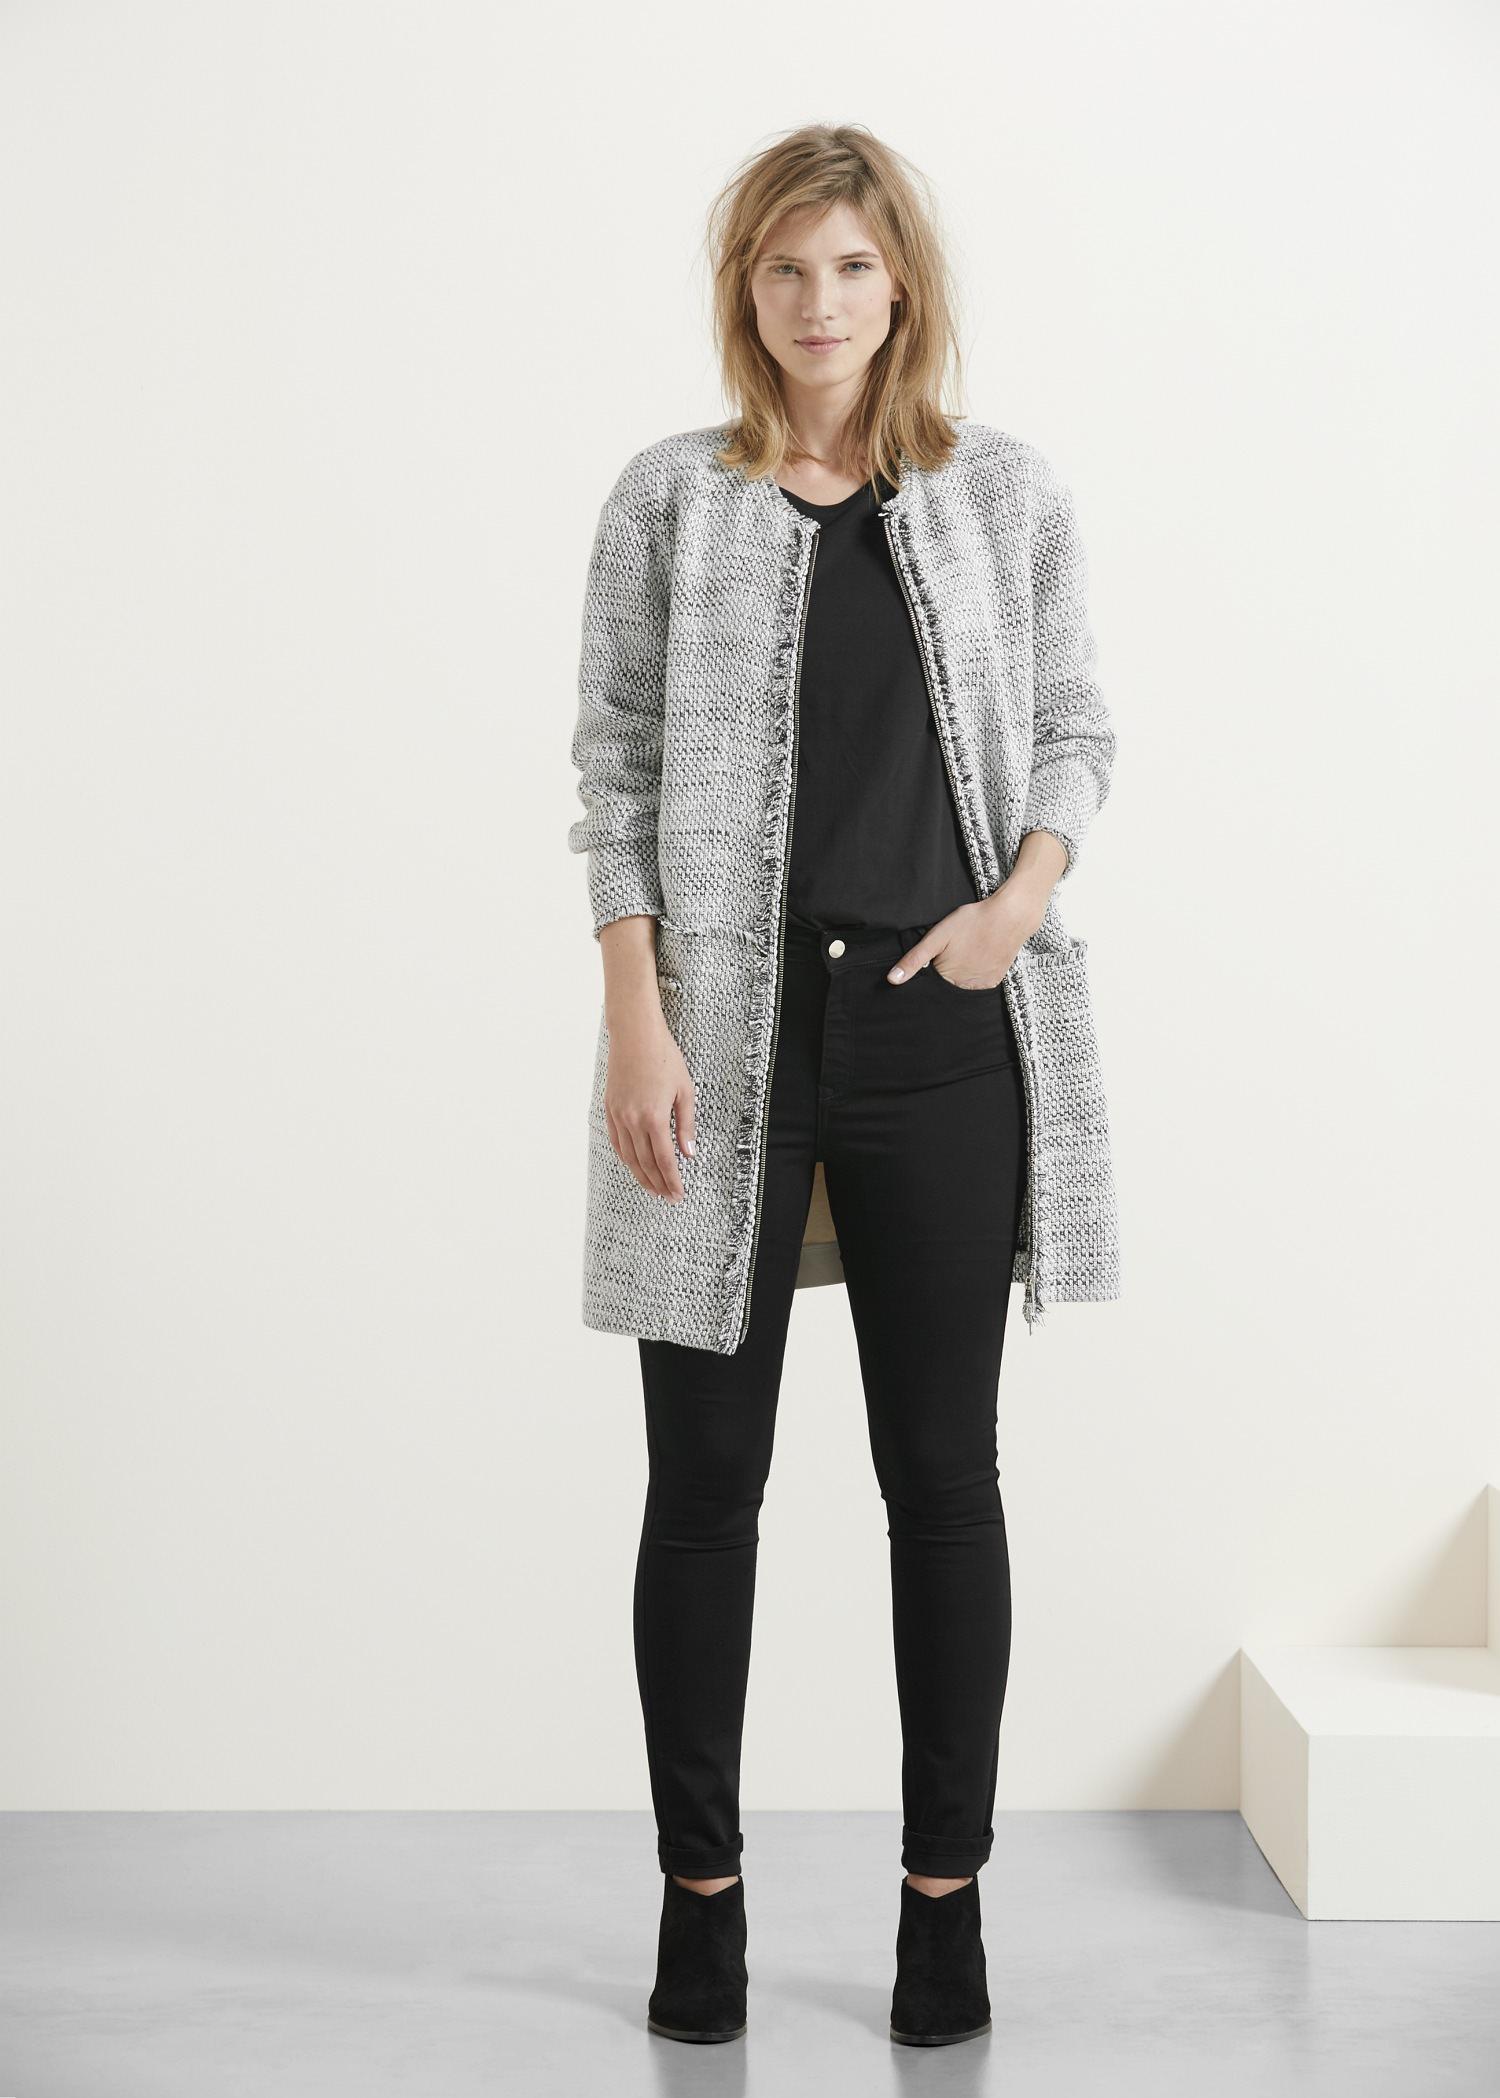 Lyst - Violeta By Mango Cotton-blend Tweed Jacket in Gray 1ad47aa6cf01